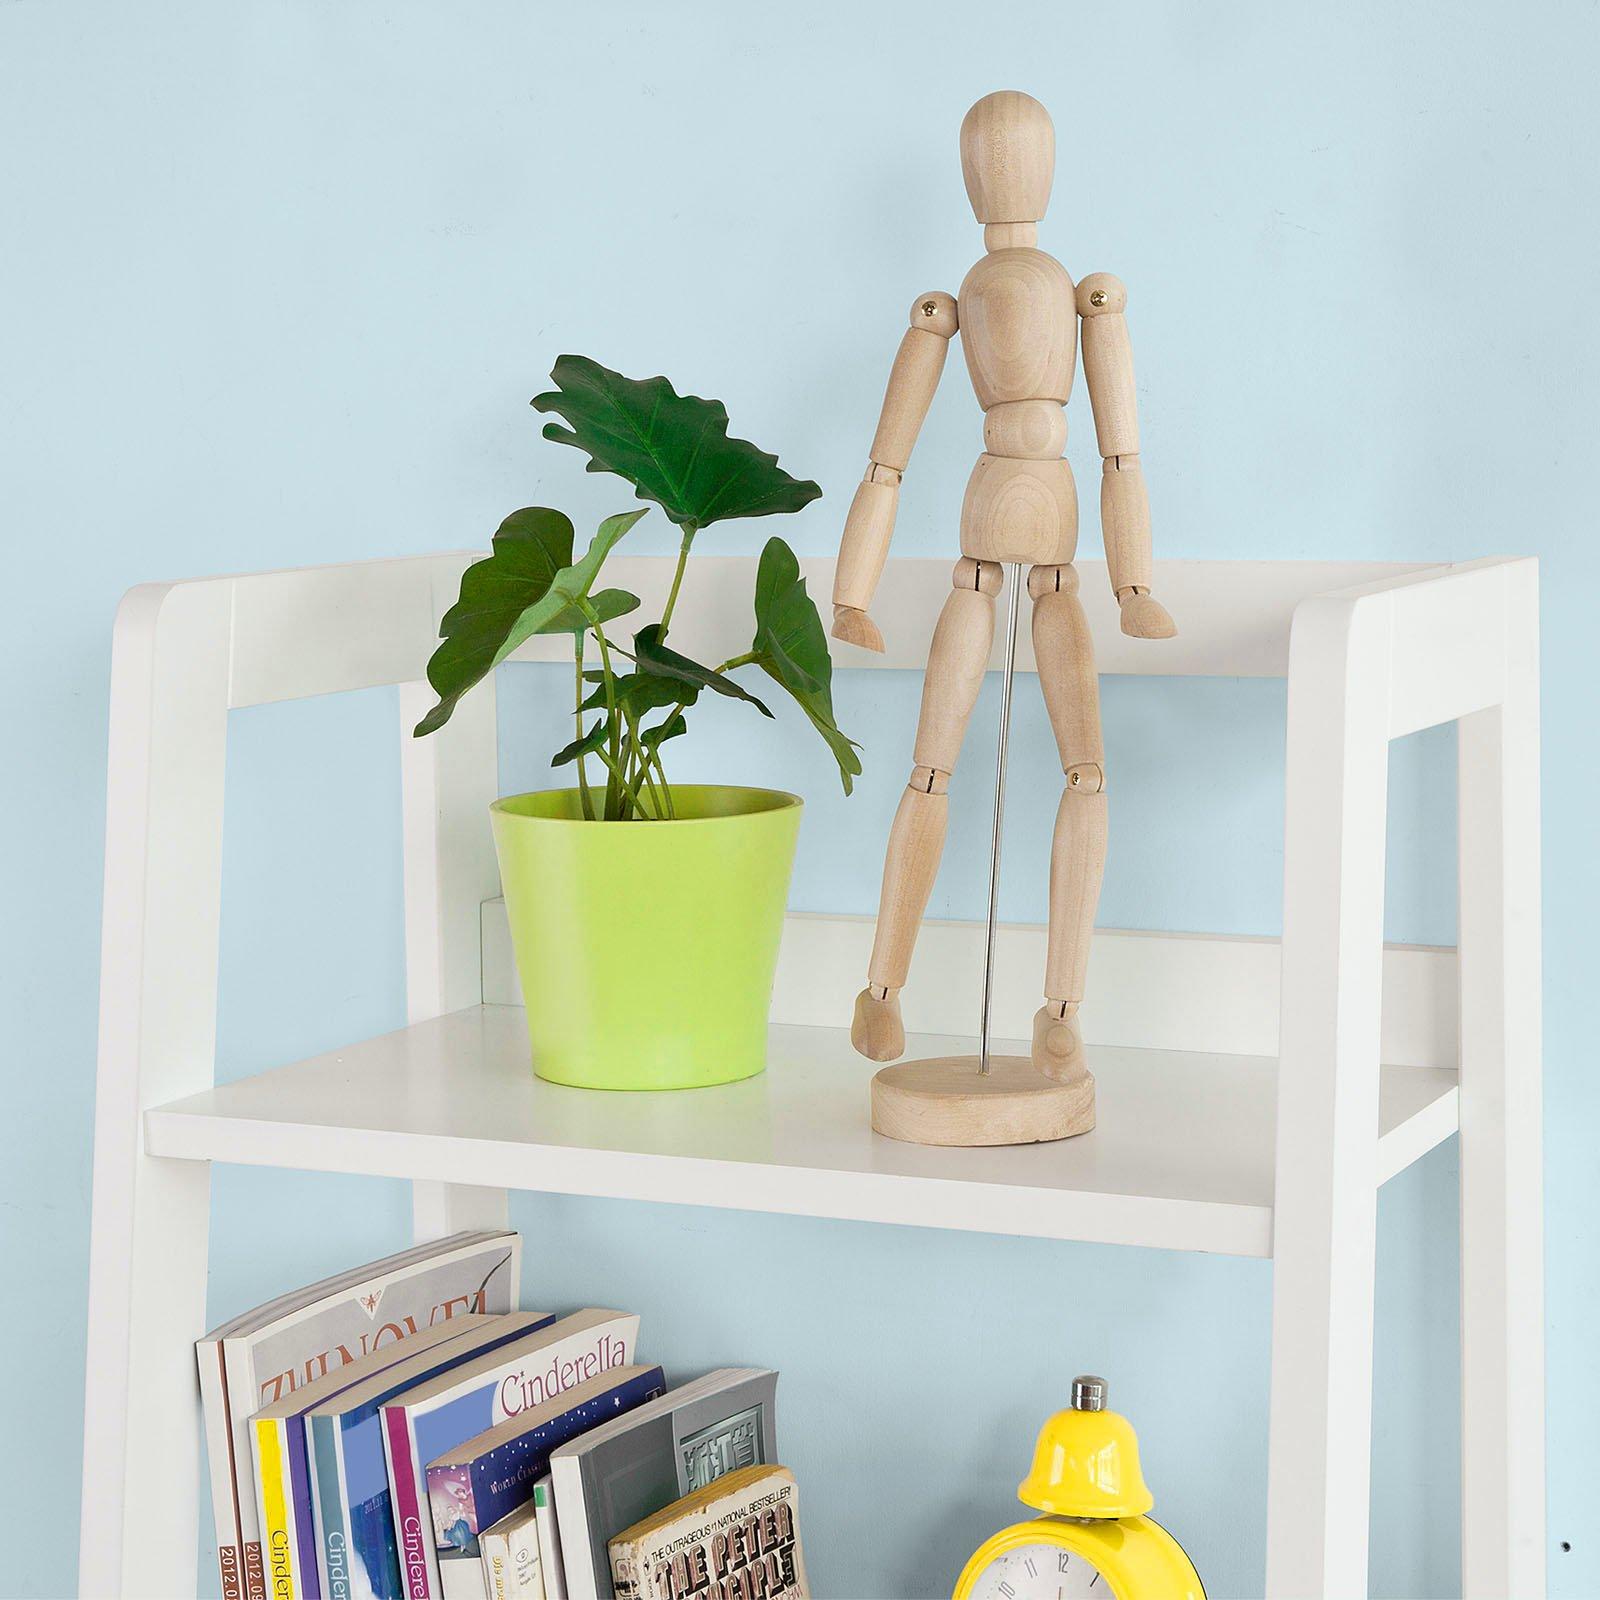 SoBuy Haotian Modern ladder bookcase made of wood, book shelf,stand shelf, wall shelf (FRG116-K-W) by SoBuy (Image #5)